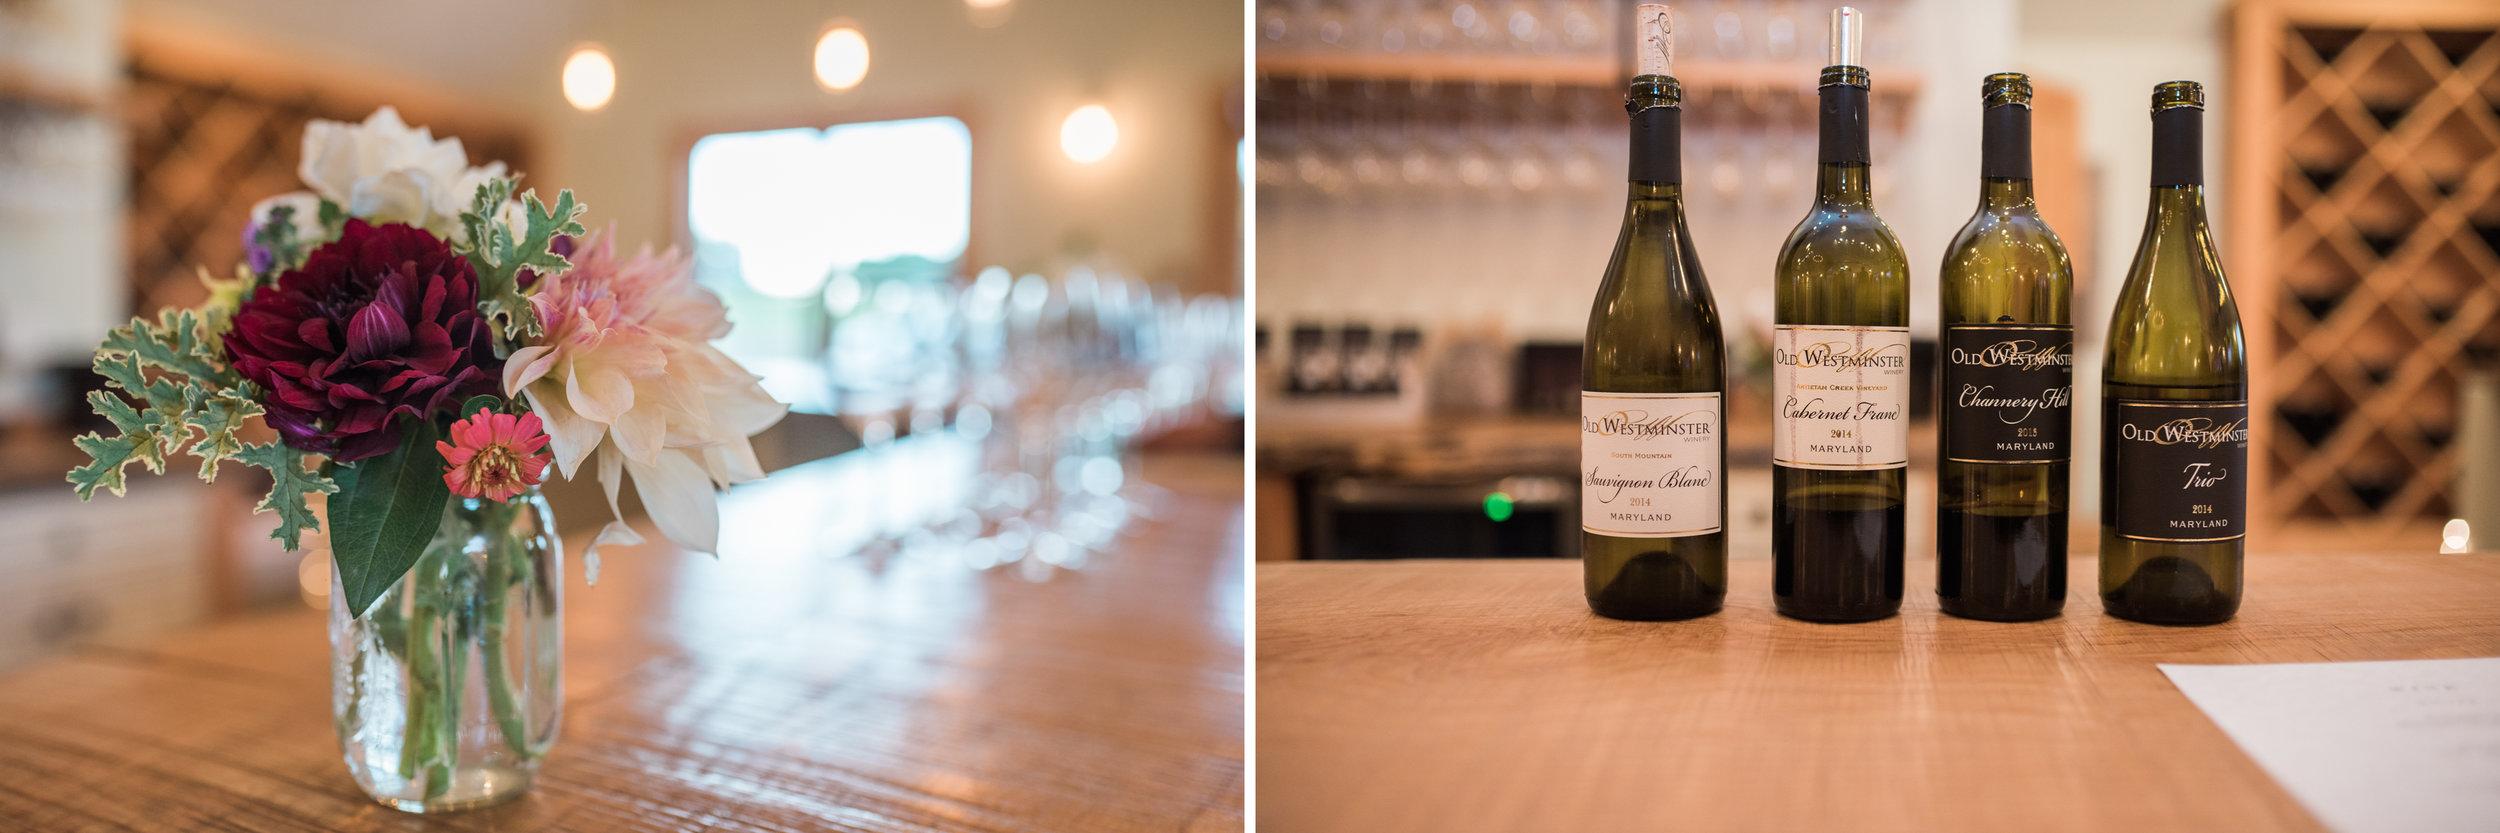 Engagement-Maryland-Winery-photos-by-BKLP-Breanna-Kuhlmann-4.jpg